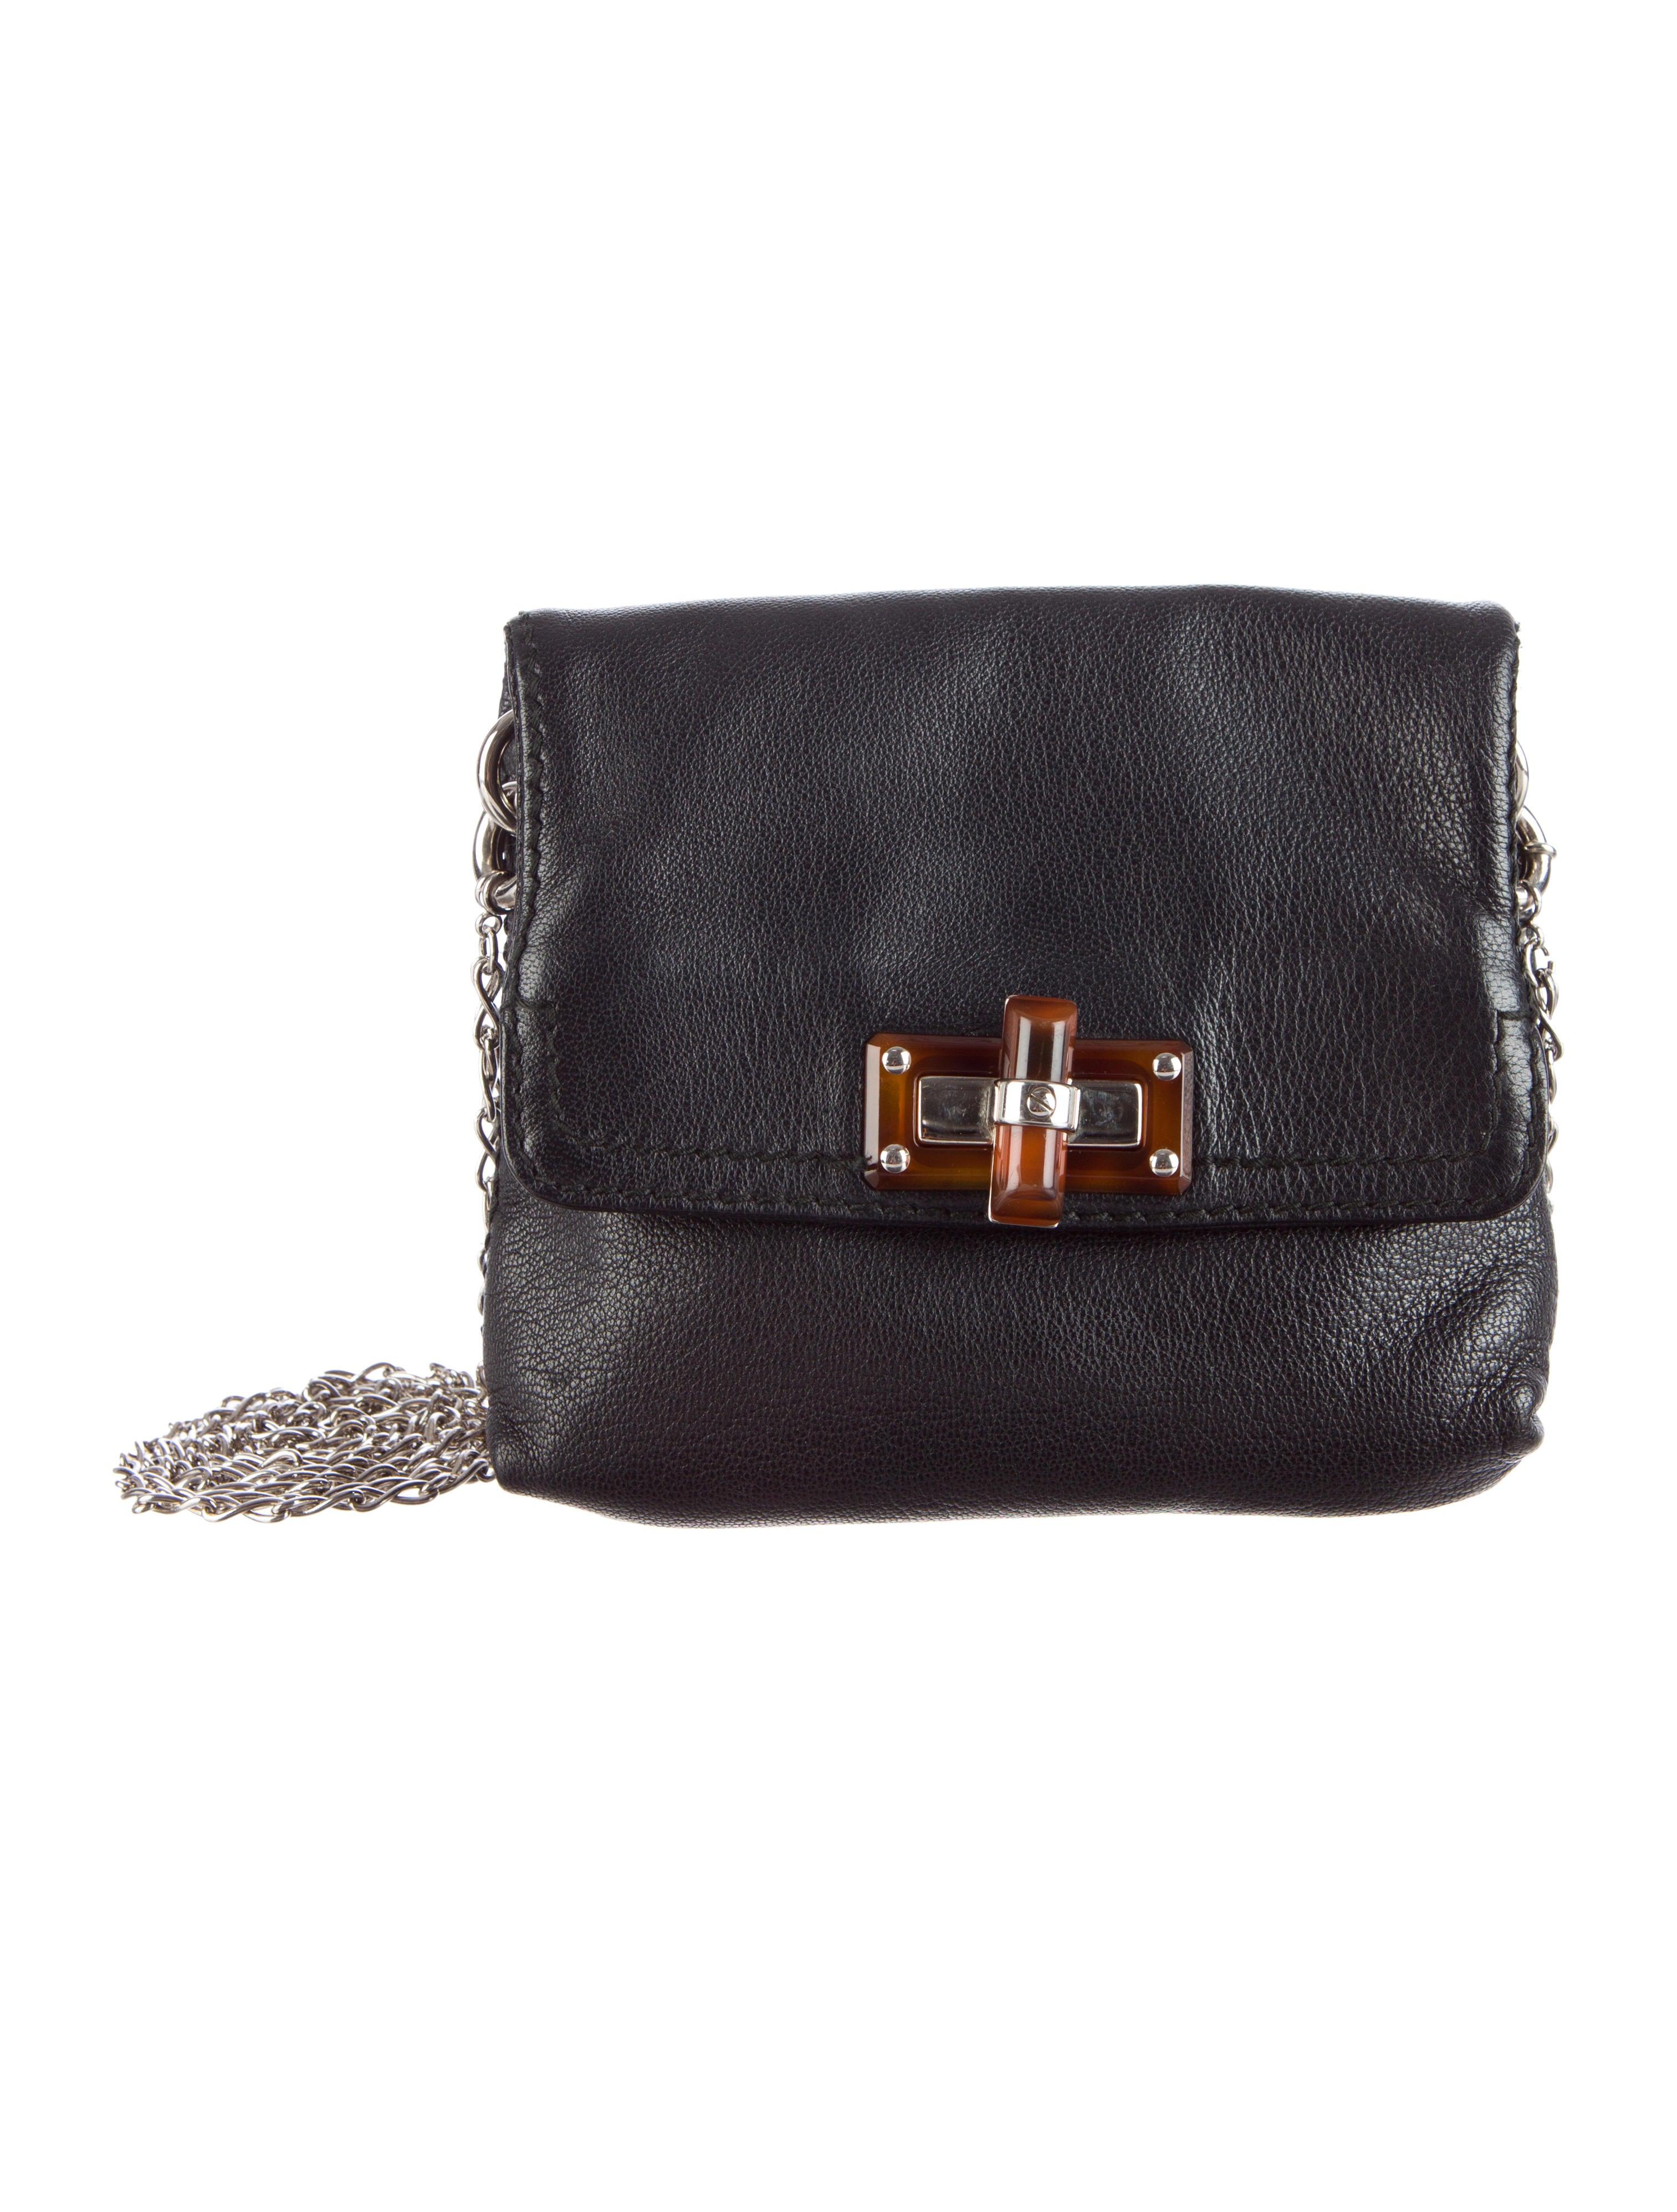 1de7b530b Lanvin Mini Pop Happy Crossbody Bag - Handbags - LAN38418 | The RealReal